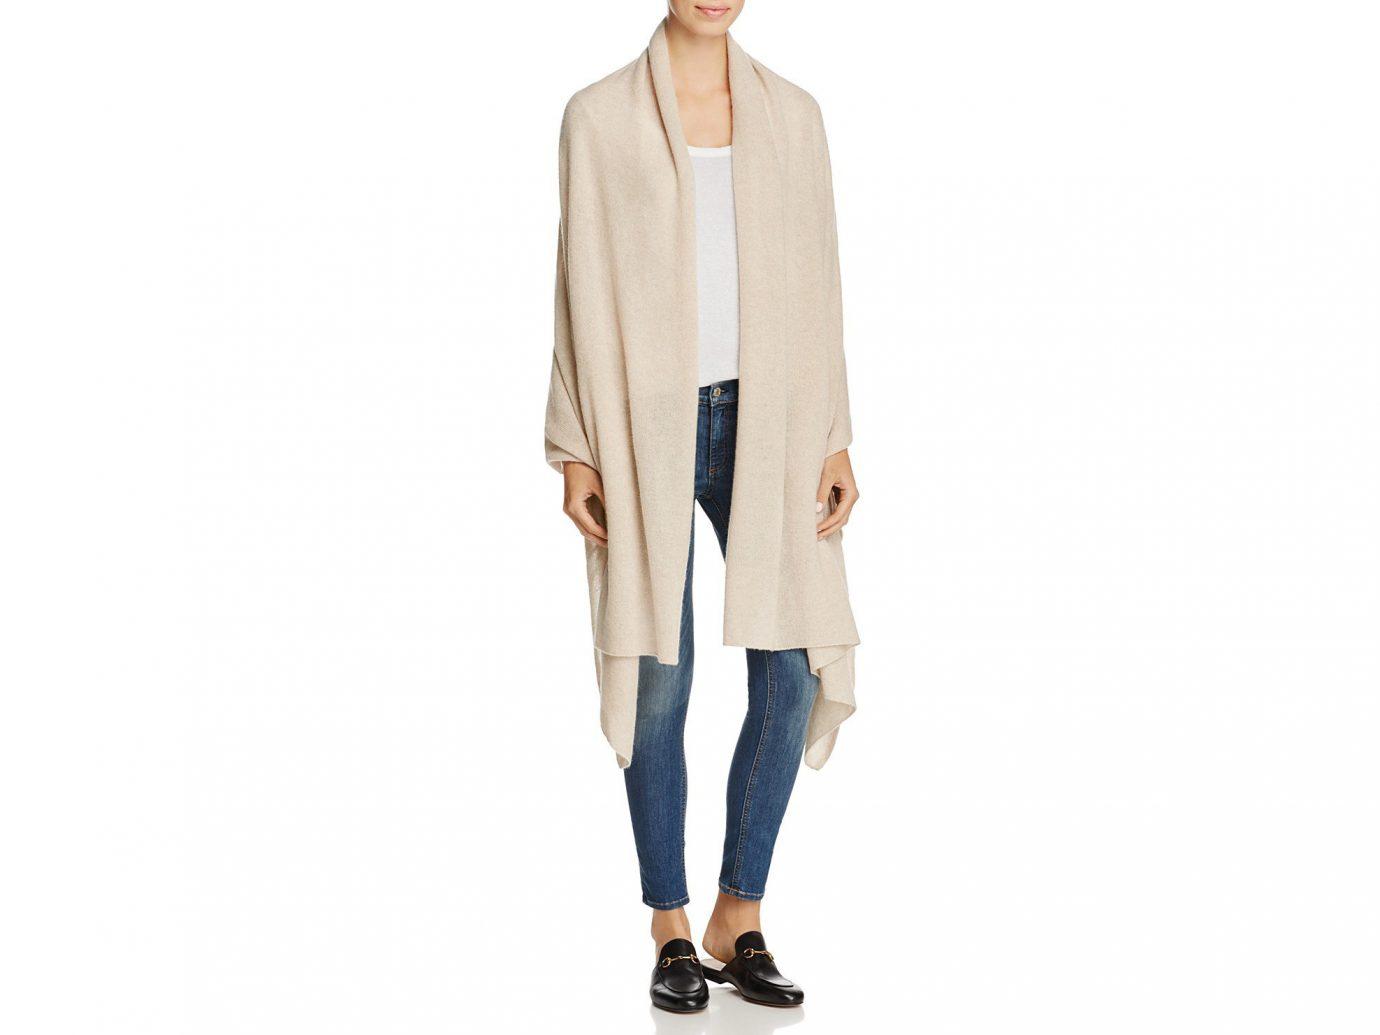 Flights Travel Shop clothing outerwear beige suit